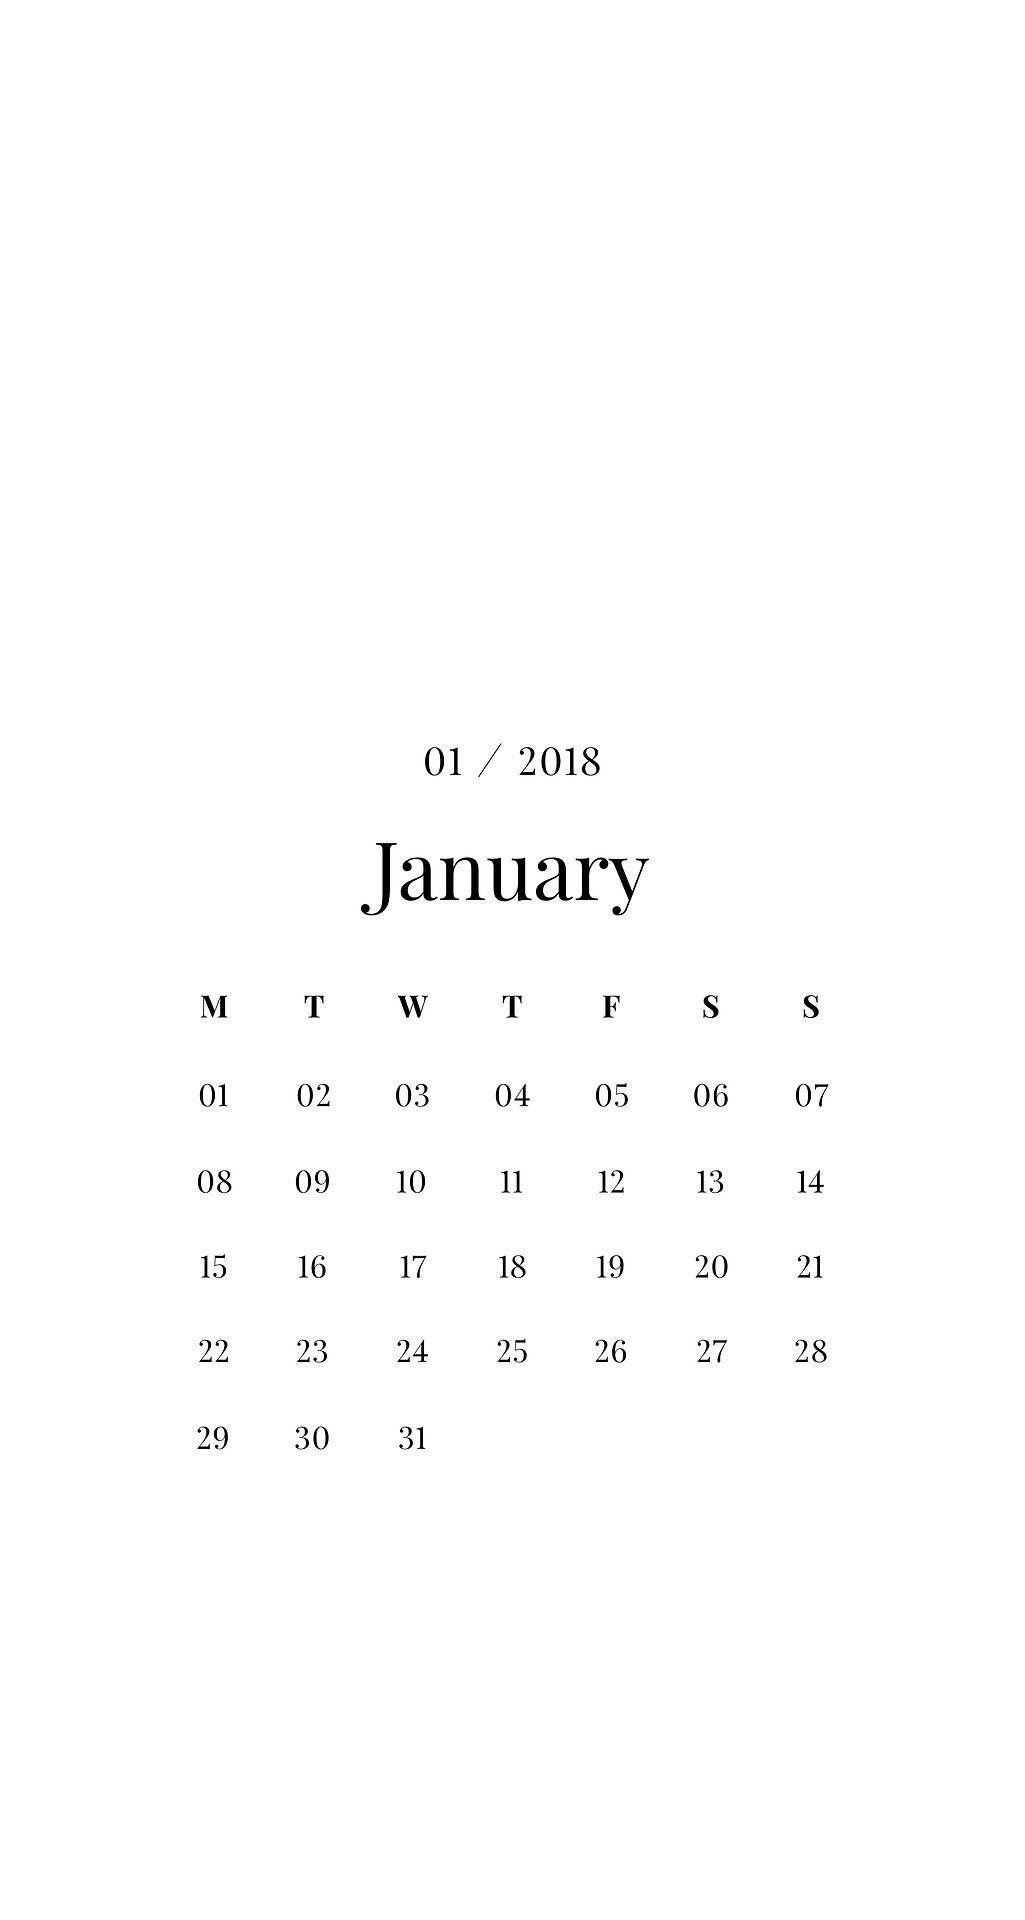 Emma's Studyblr January Minimalist Calendar Phone Iphone - January 2019 Wallpaper Minimalist , HD Wallpaper & Backgrounds